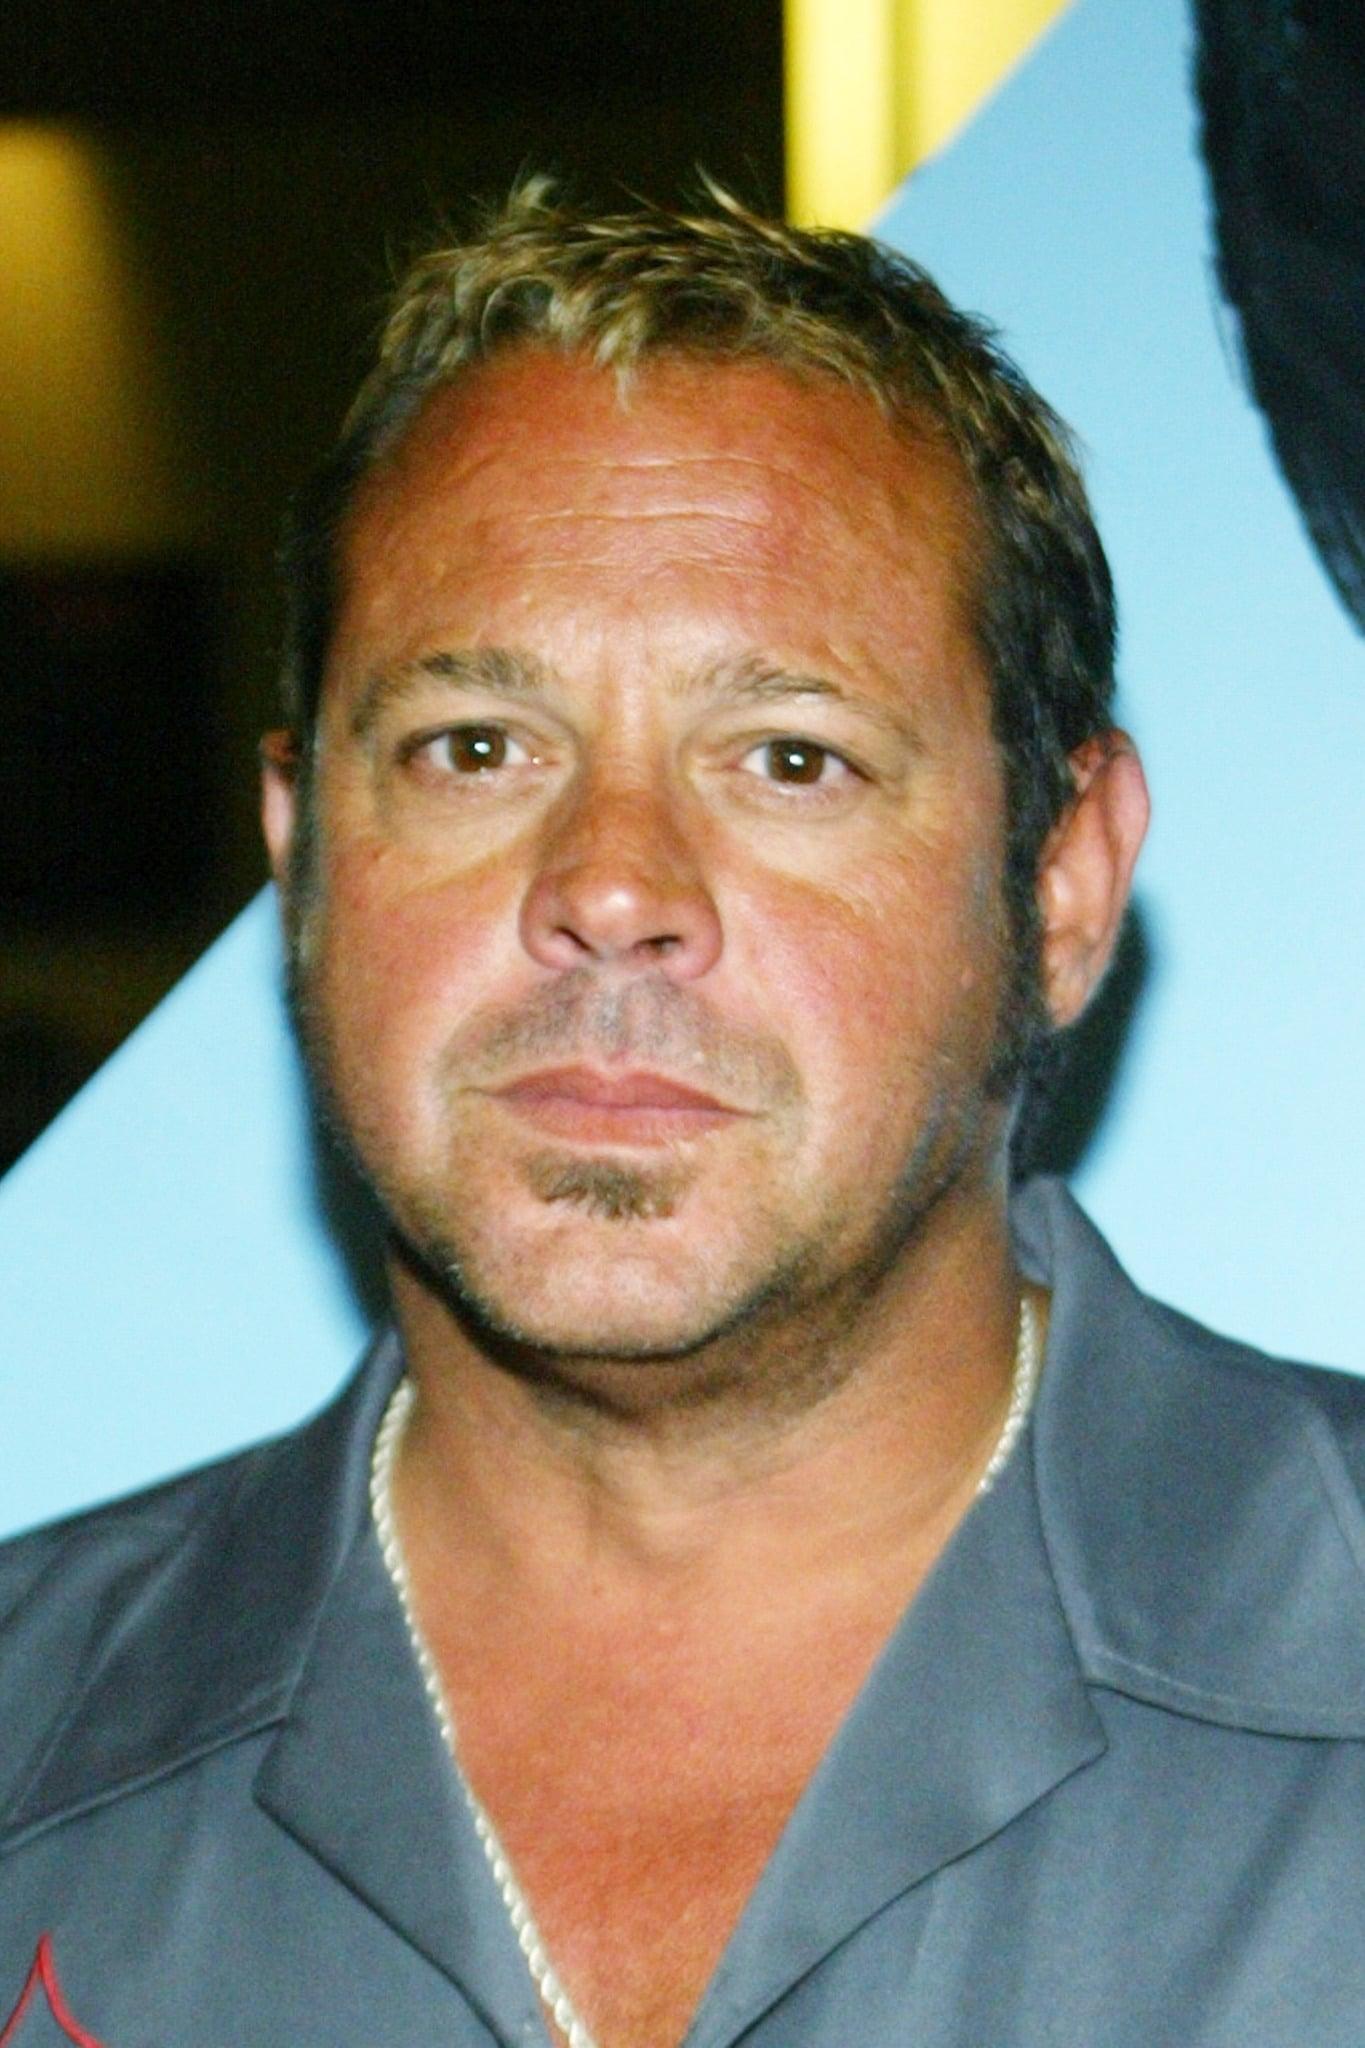 Chad McQueen